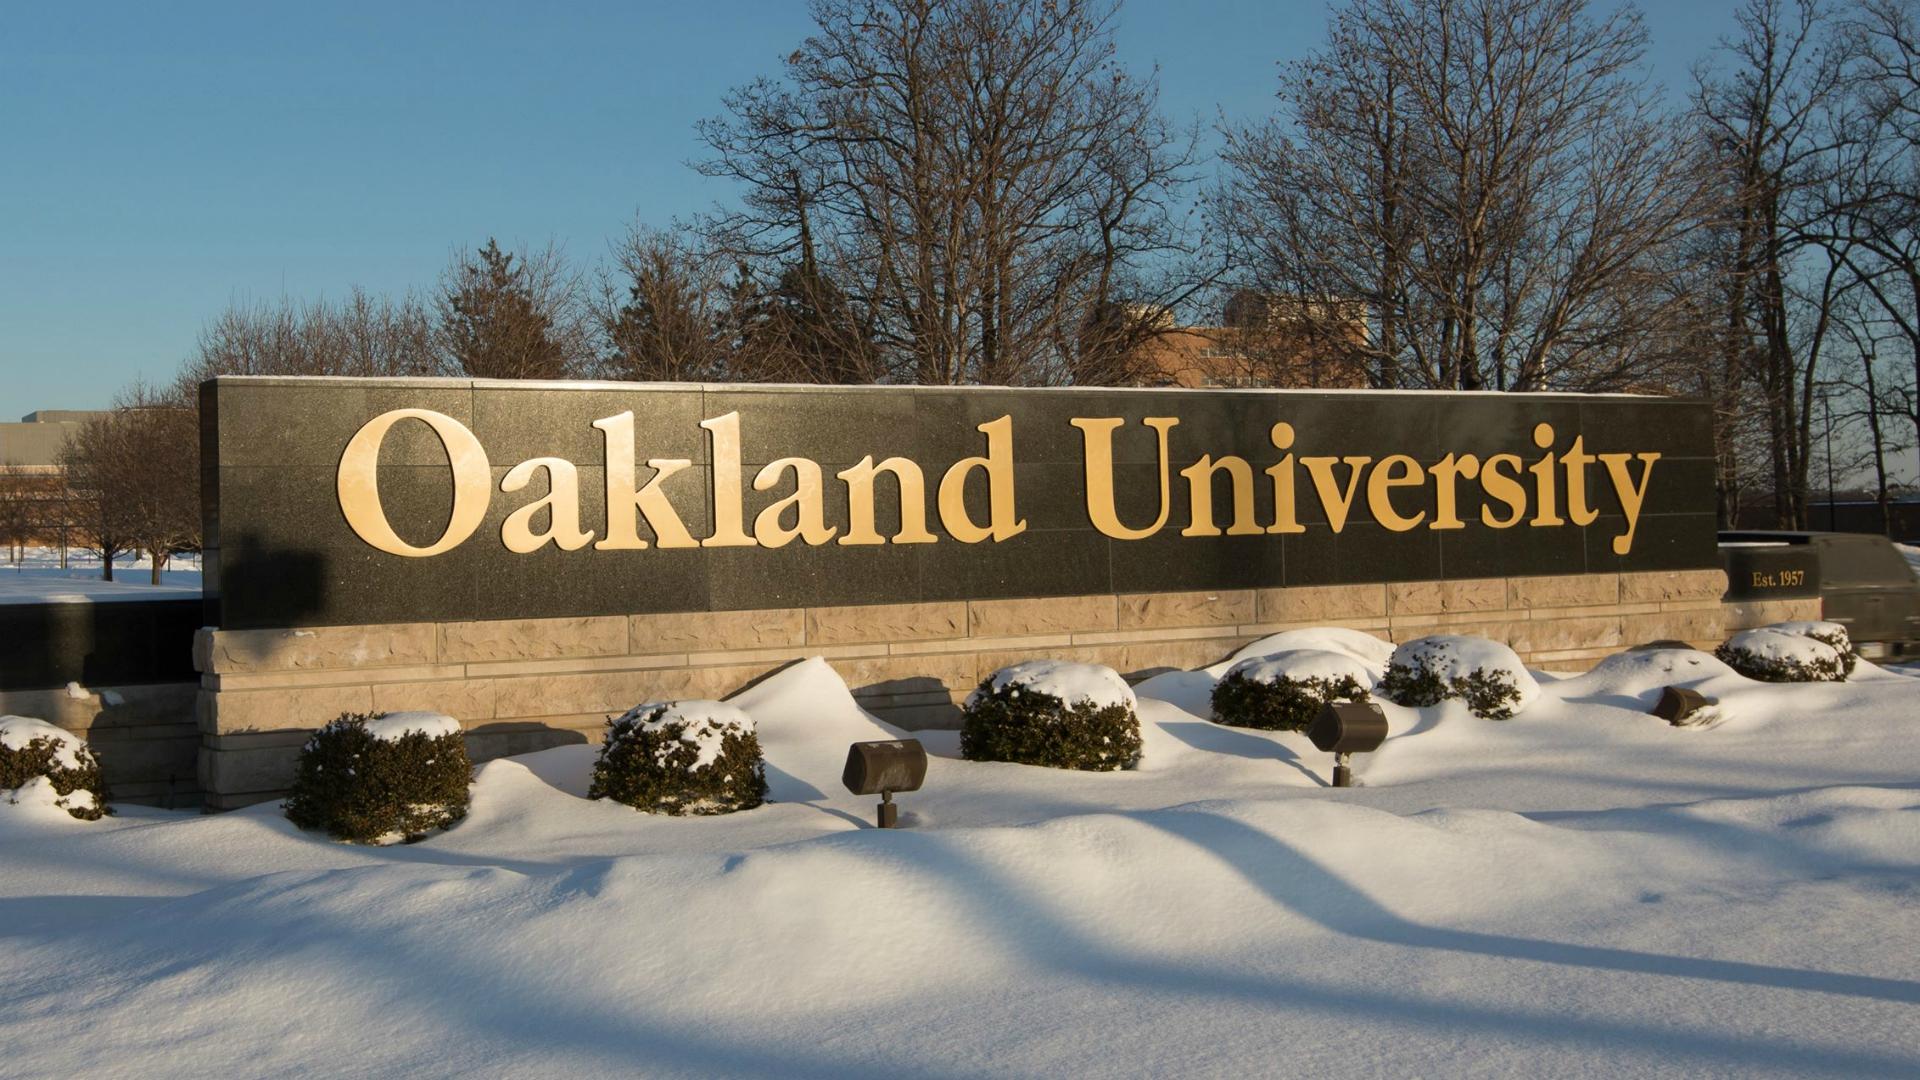 generic oakland university_1543367890219.jpg.jpg